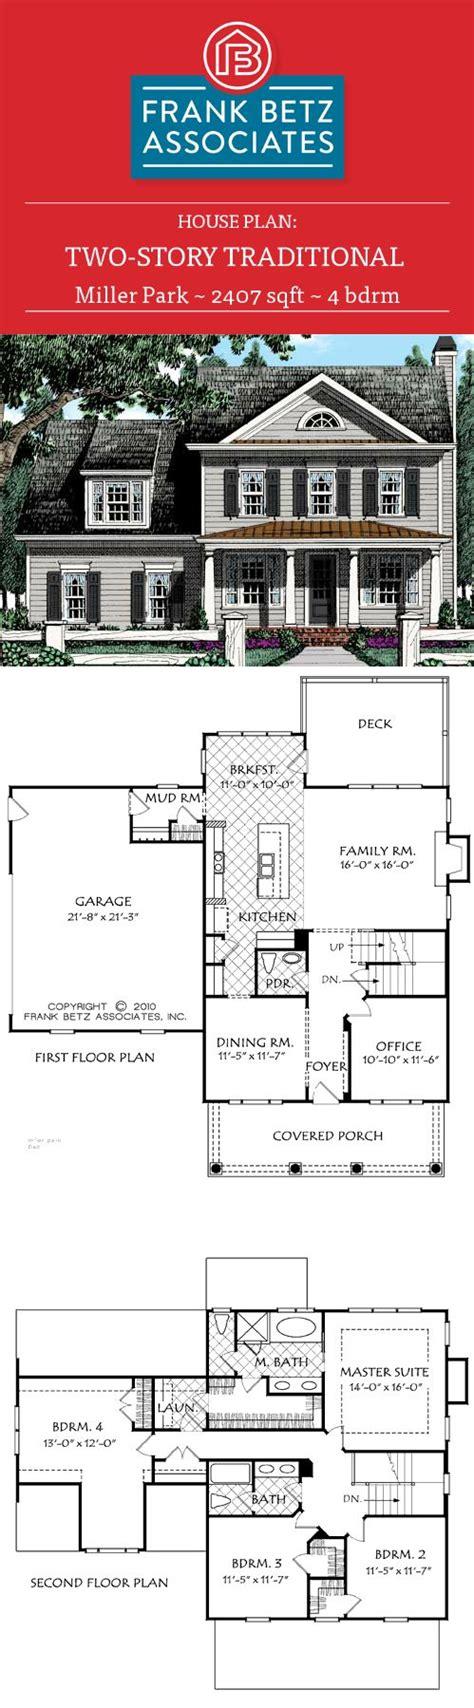 fun house plans 27 best popular frank betz house plans images on pinterest house floor plans fun